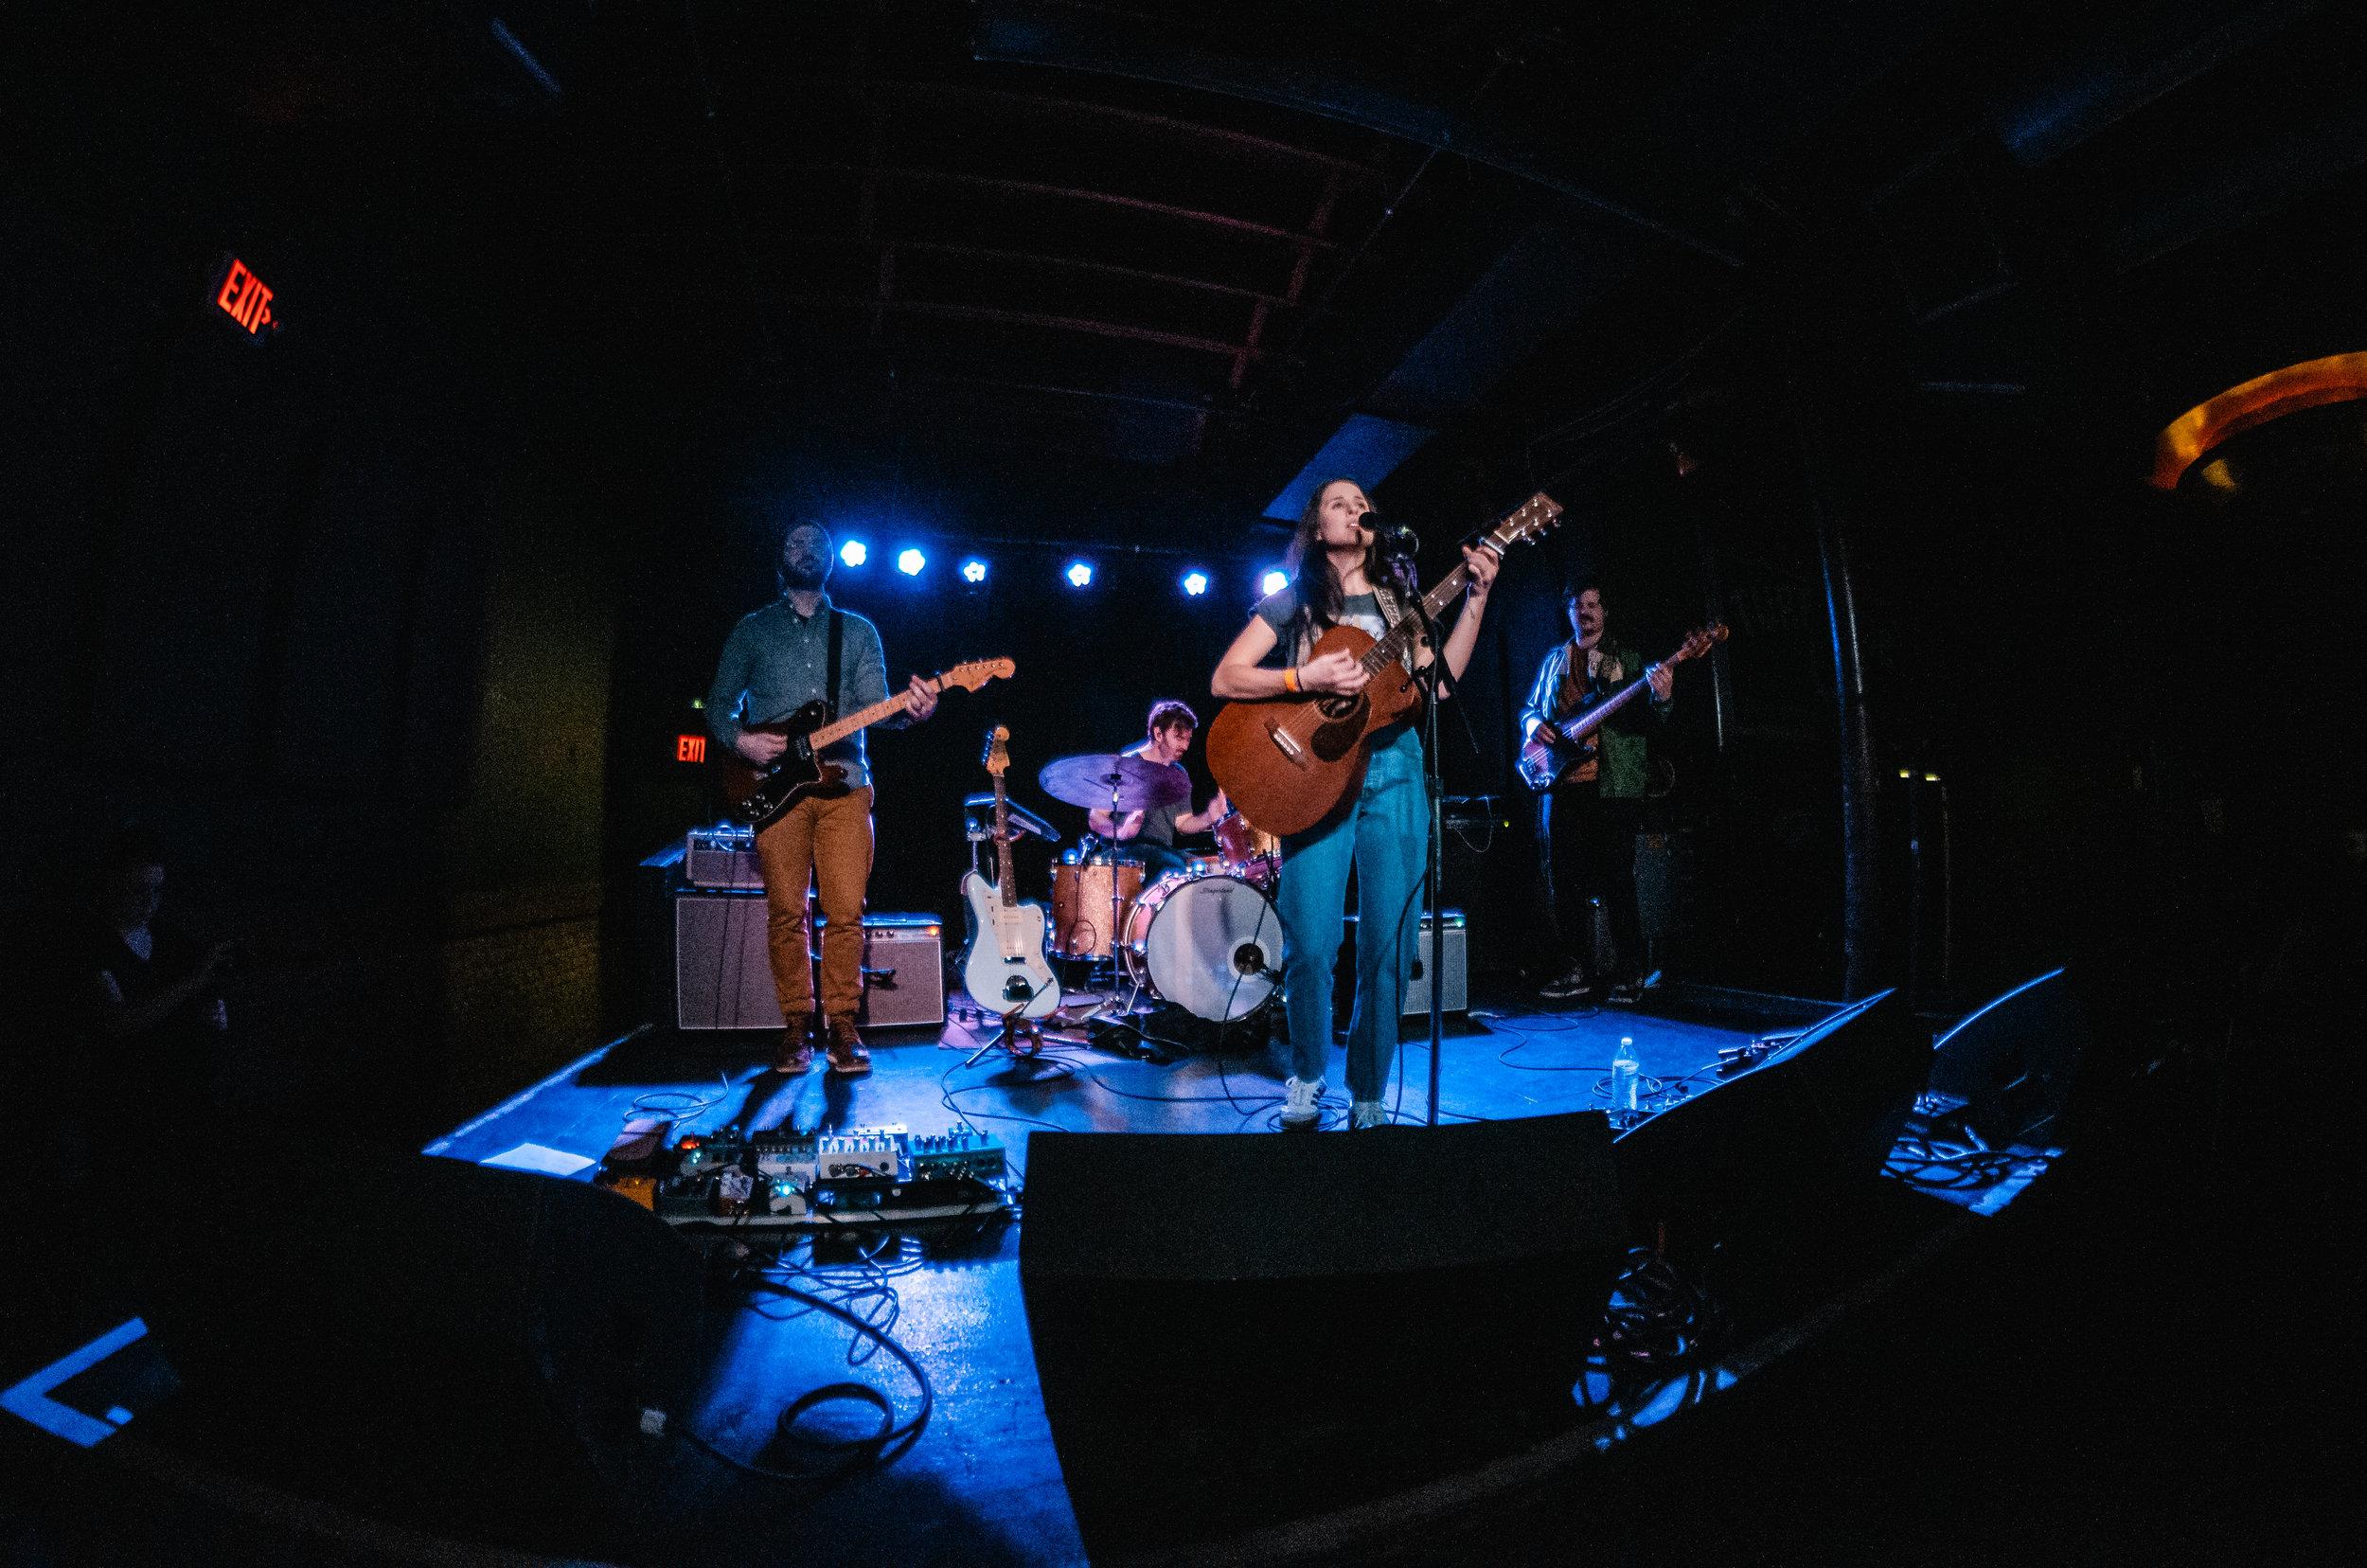 Photo by Dan Brakke - Turf Club 2019